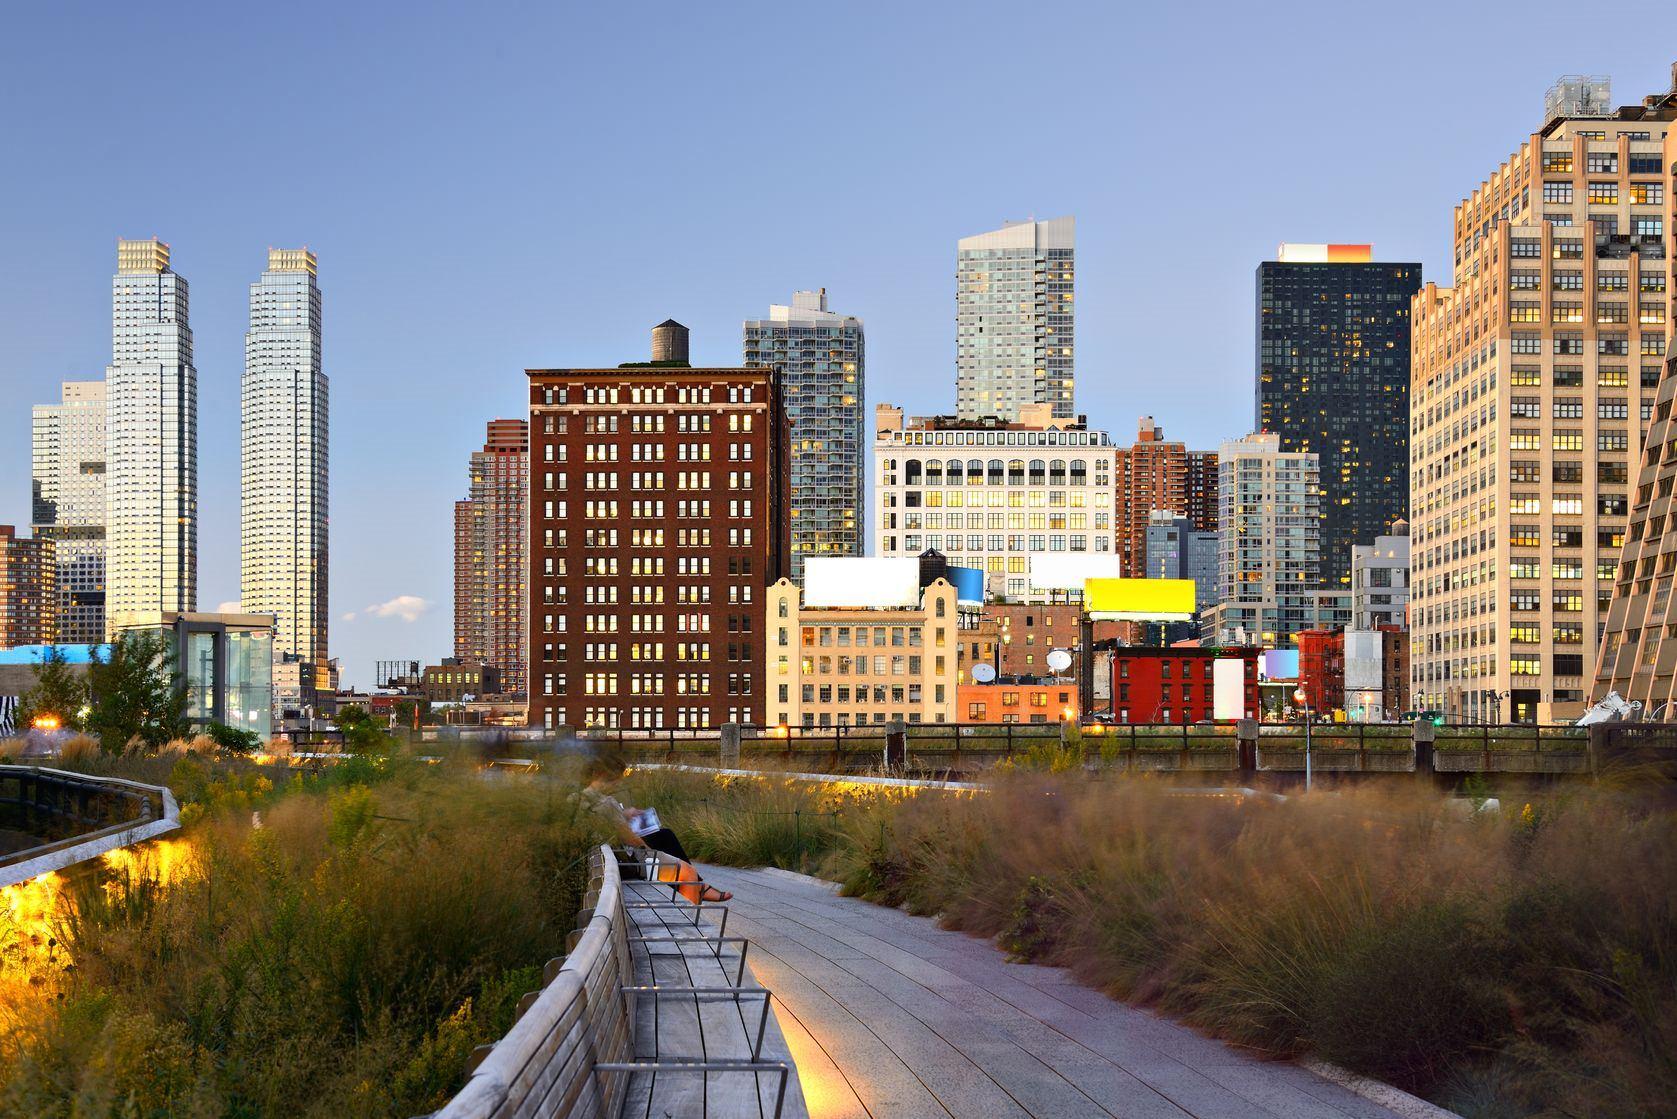 Top 10 Tuesday's: Rental and Neighborhood Guide